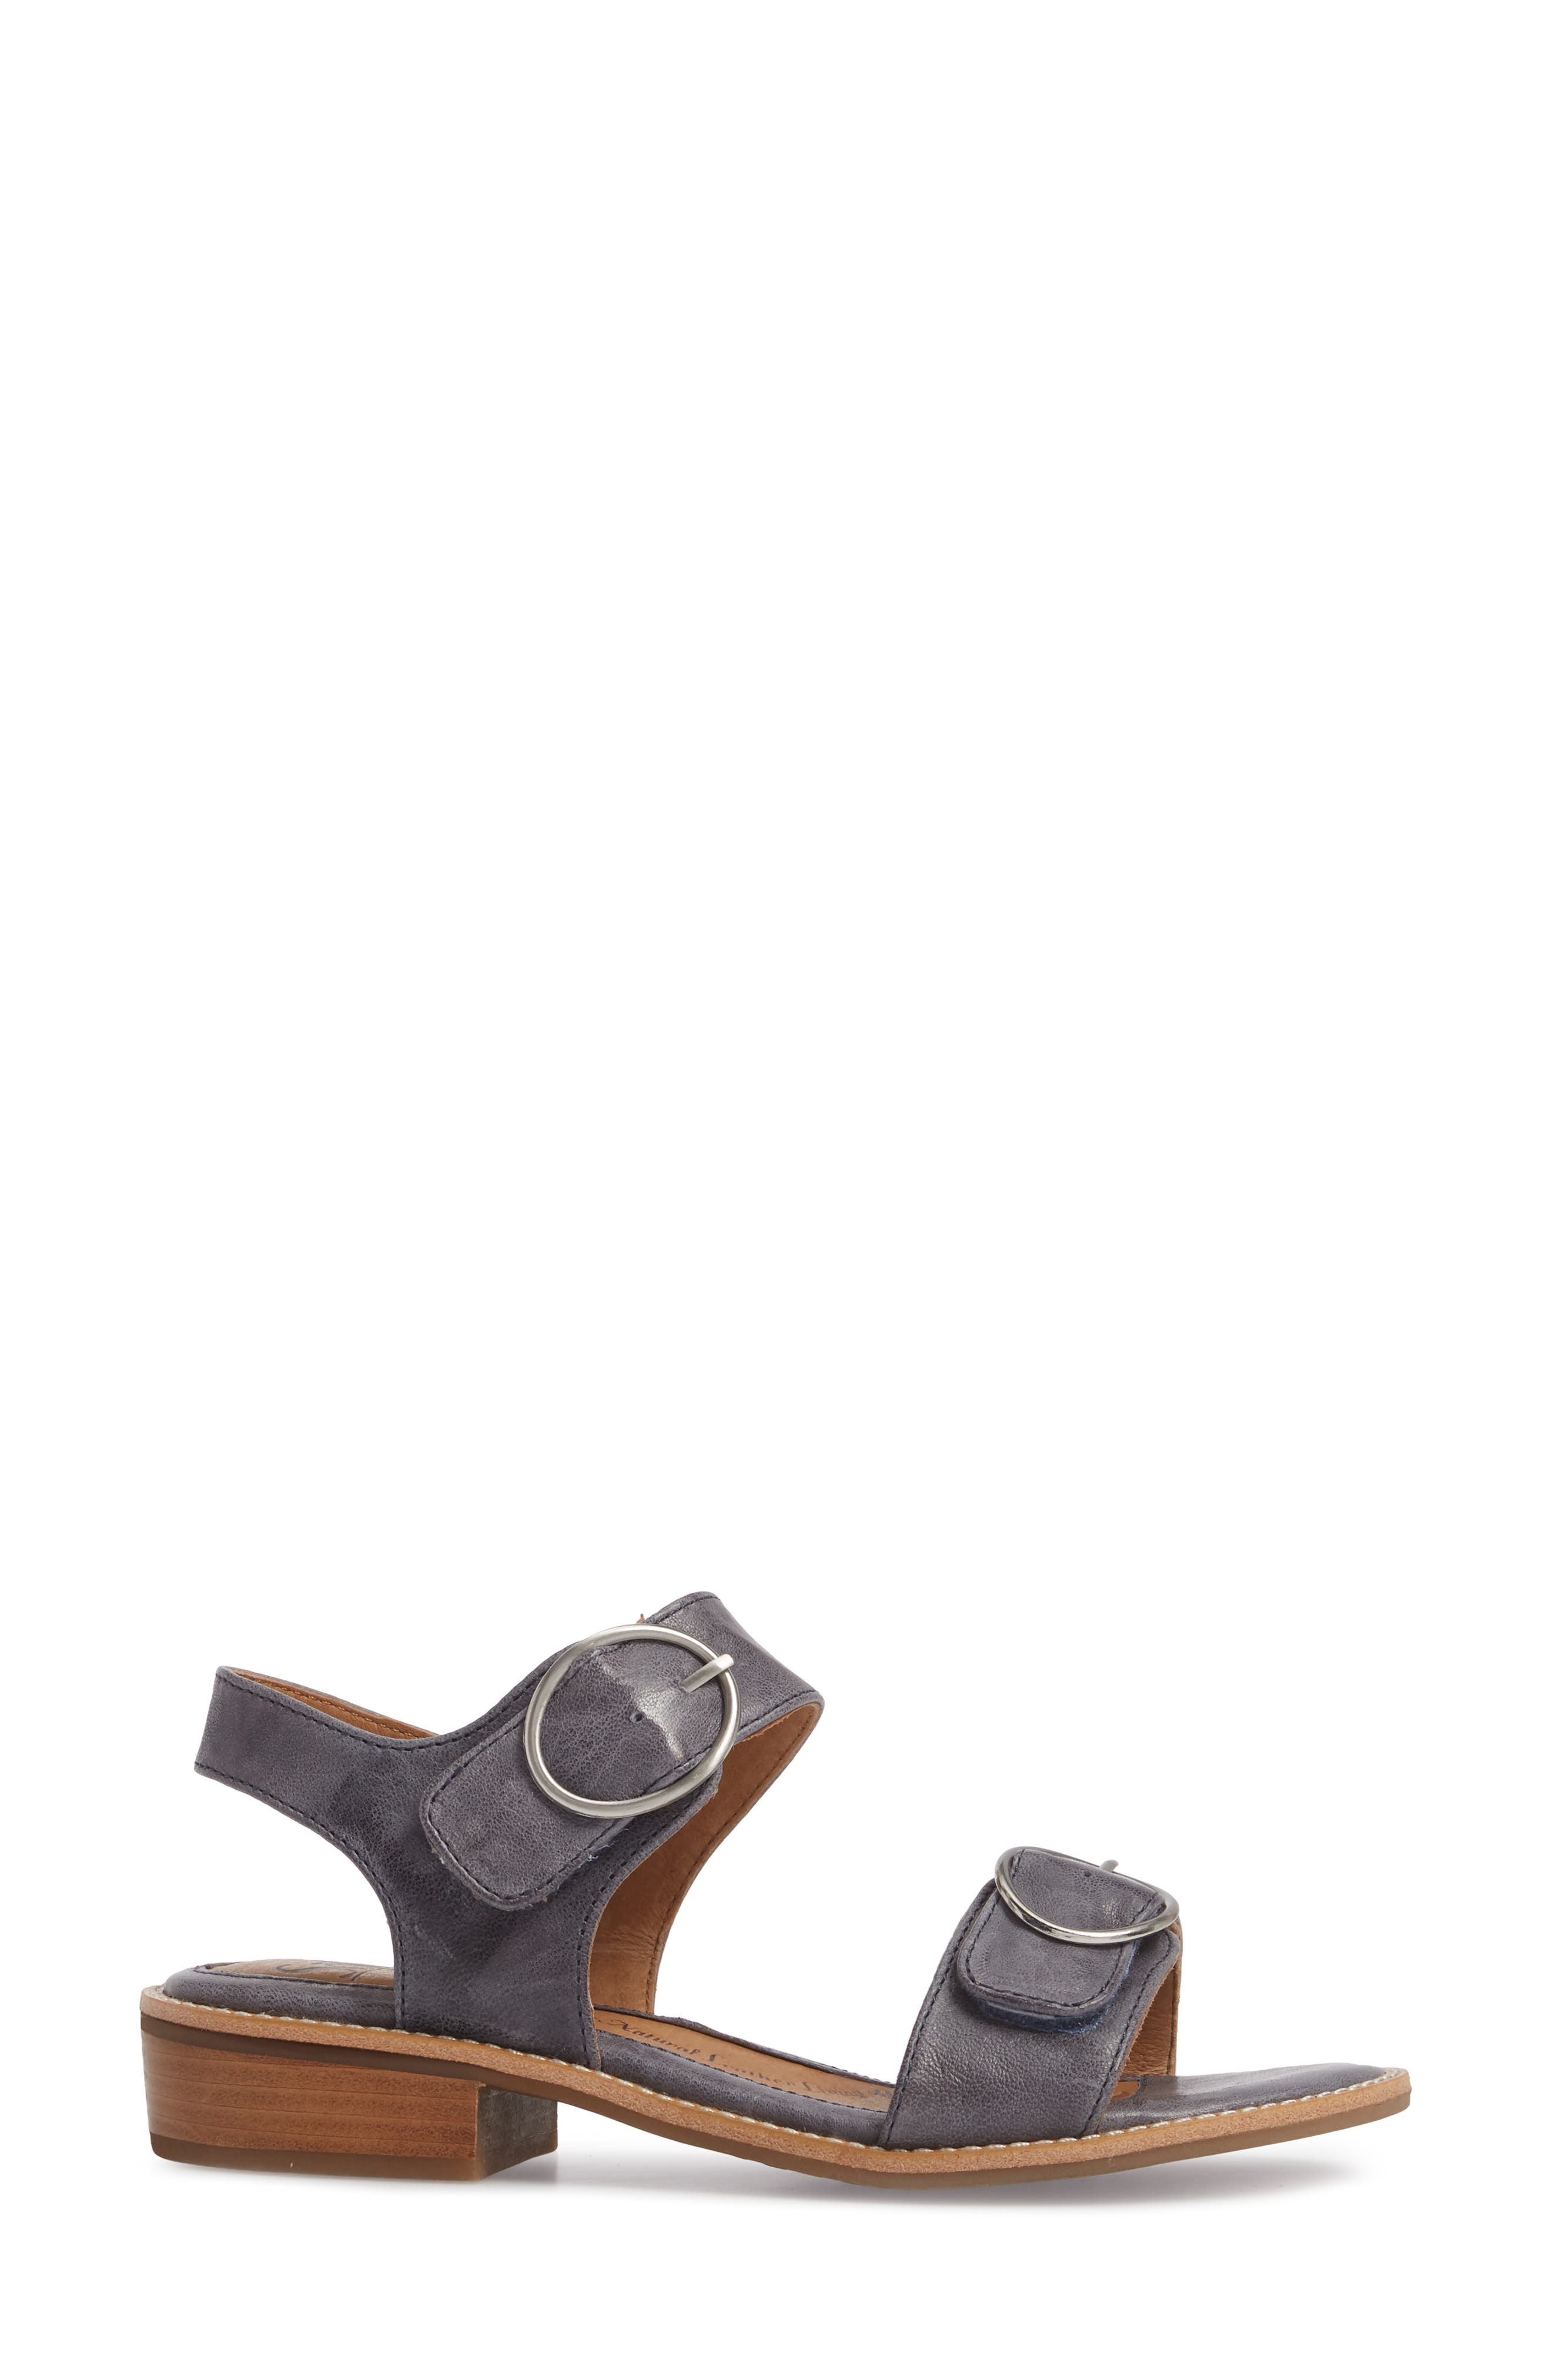 Nerissa Sandal,                             Alternate thumbnail 3, color,                             Chambray Leather